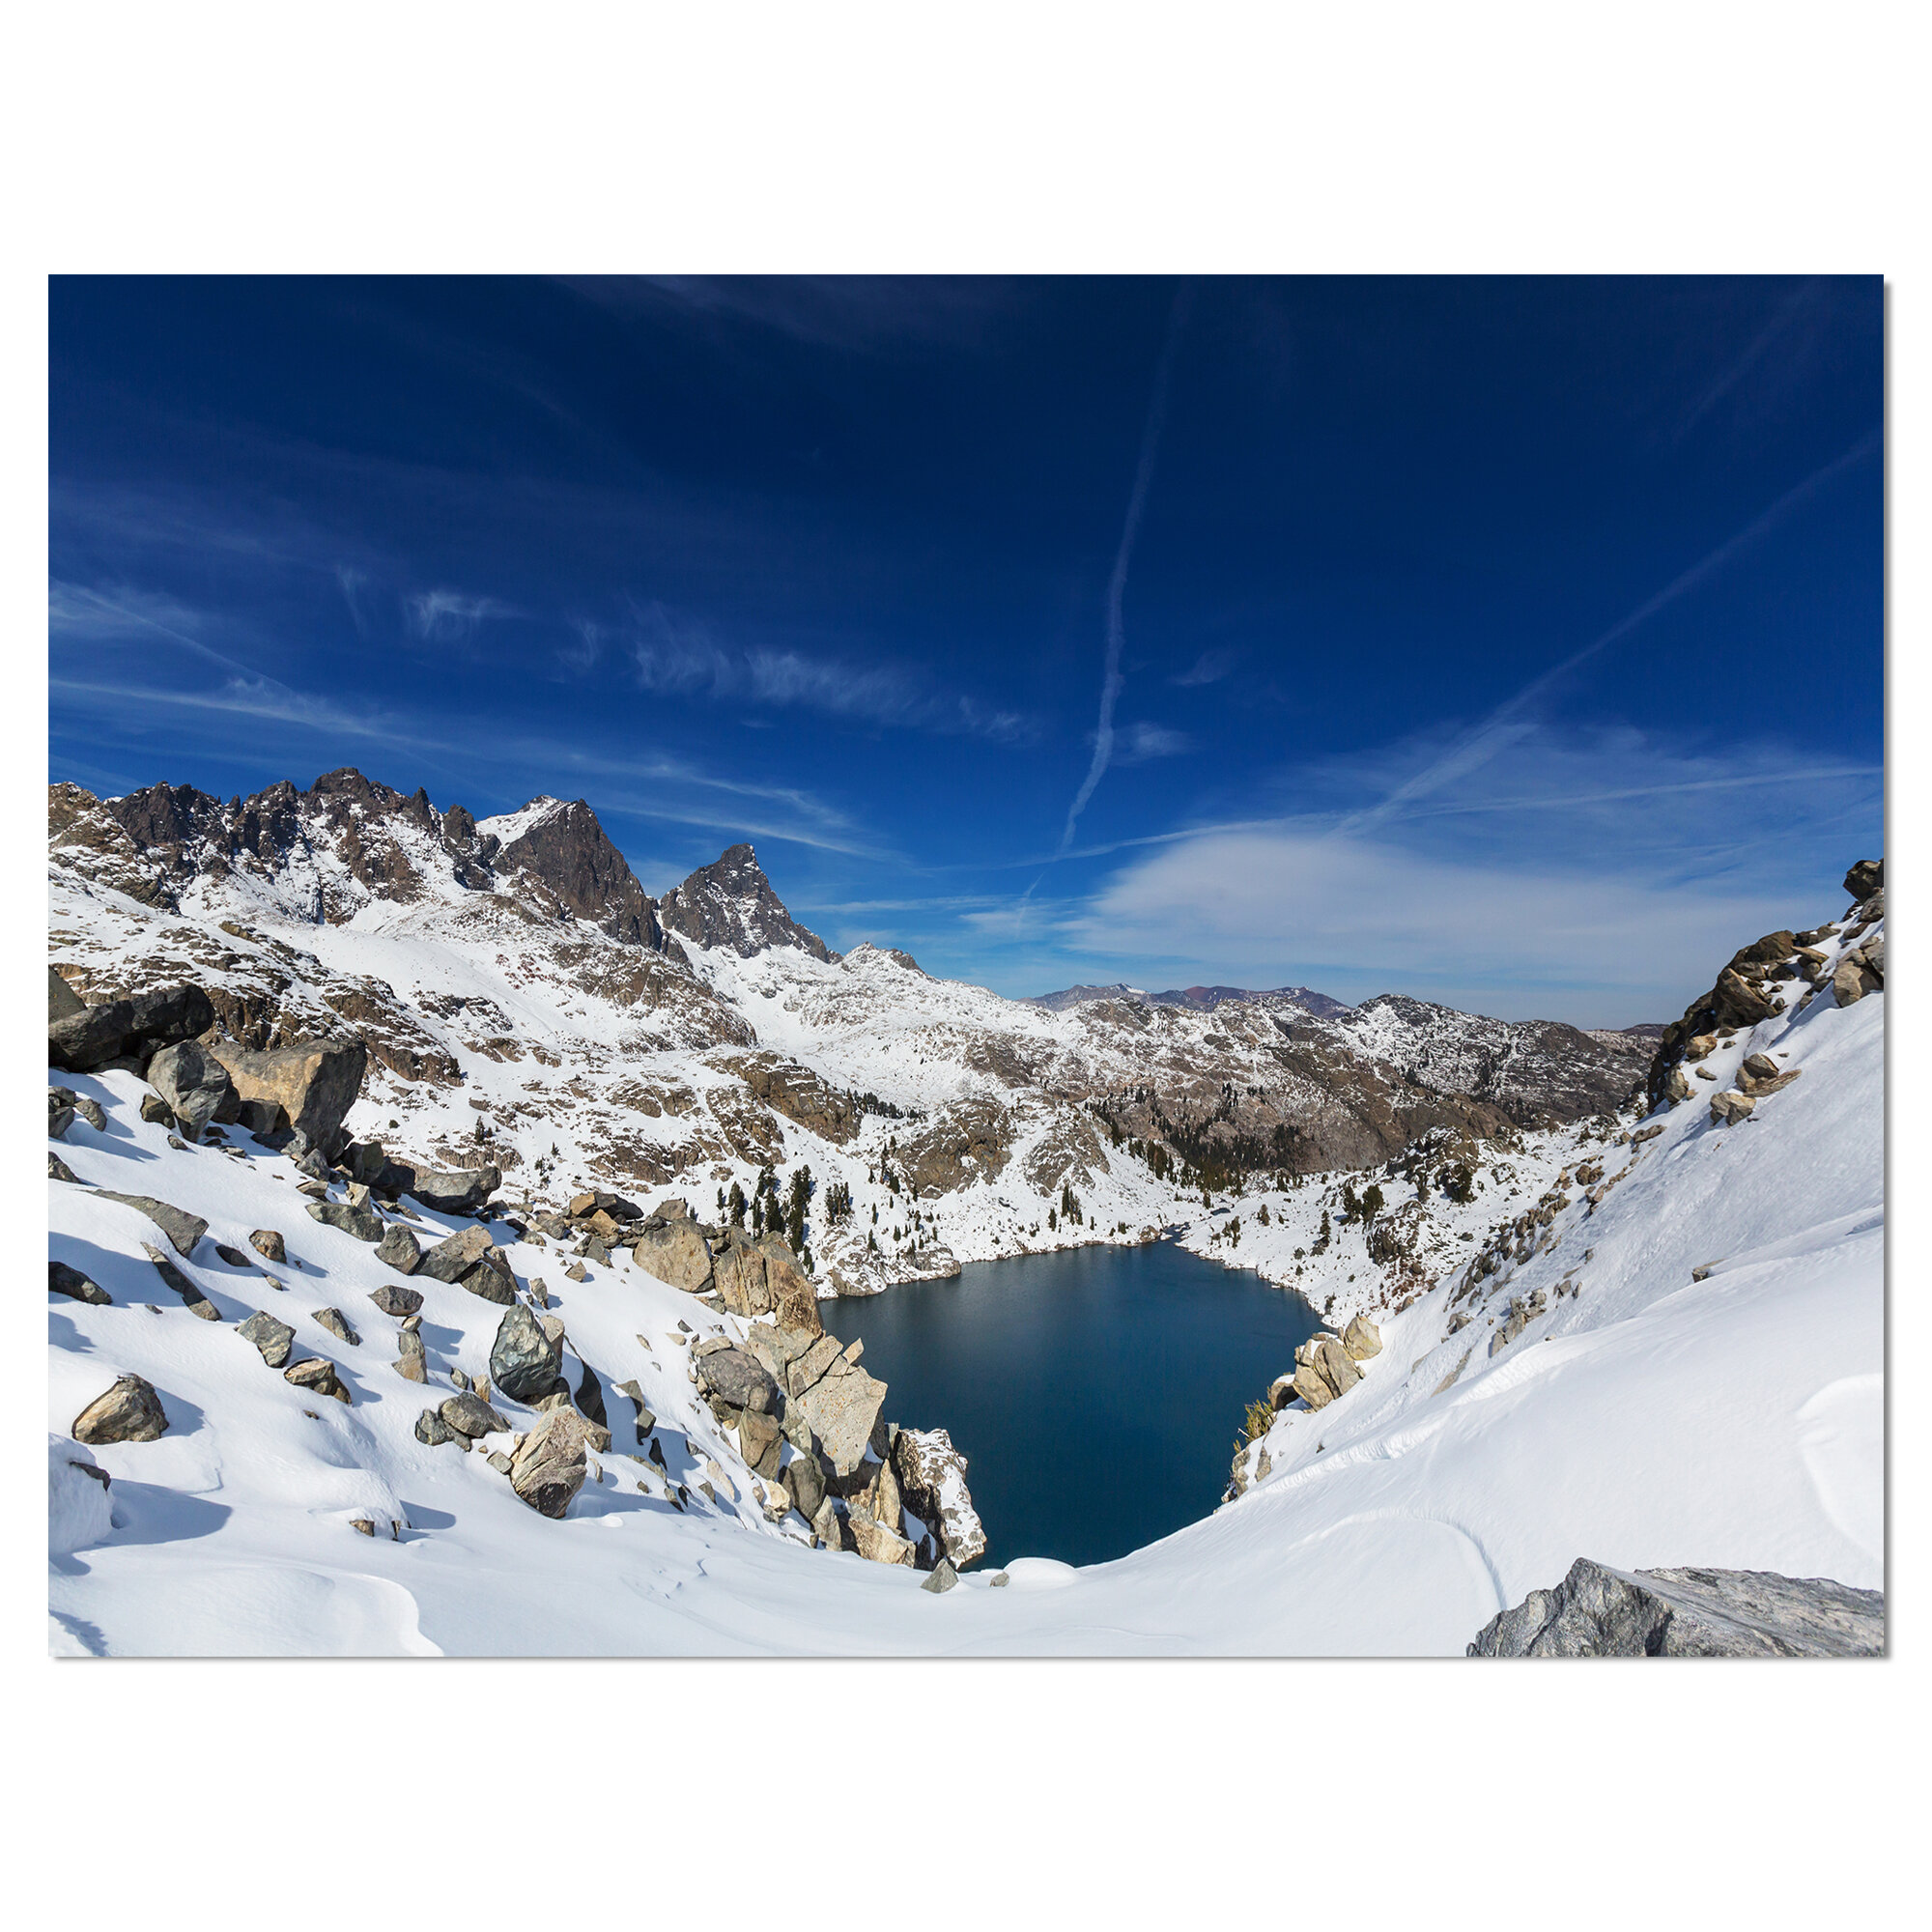 East Urban Home Sierra Nevada Mountains Under Blue Sky Photographic Print On Wrapped Canvas Wayfair